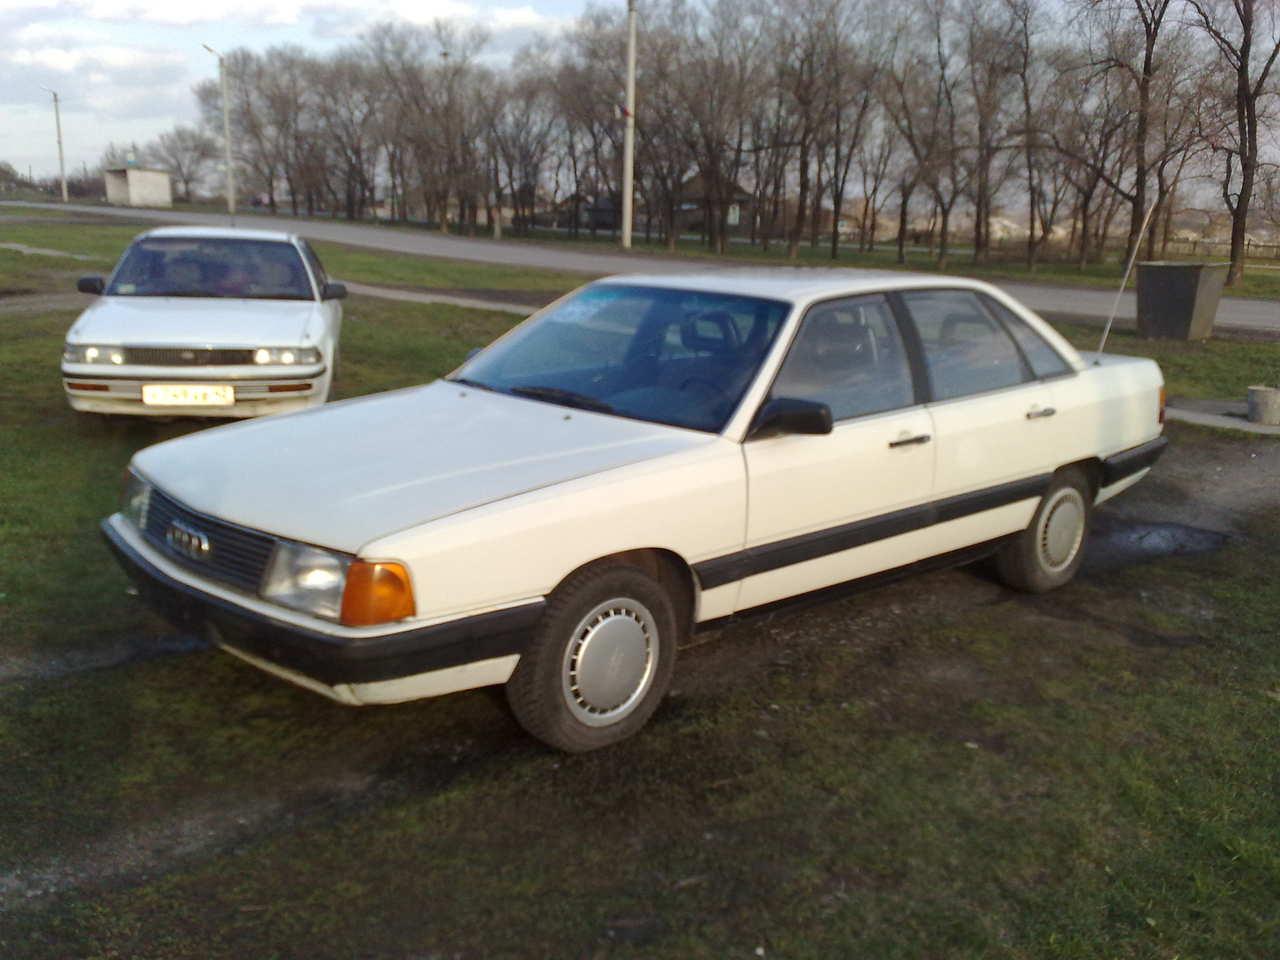 1985 AUDI 100 specs, Engine size 1800cm3, Fuel type Gasoline, Drive wheels FF, Transmission ...